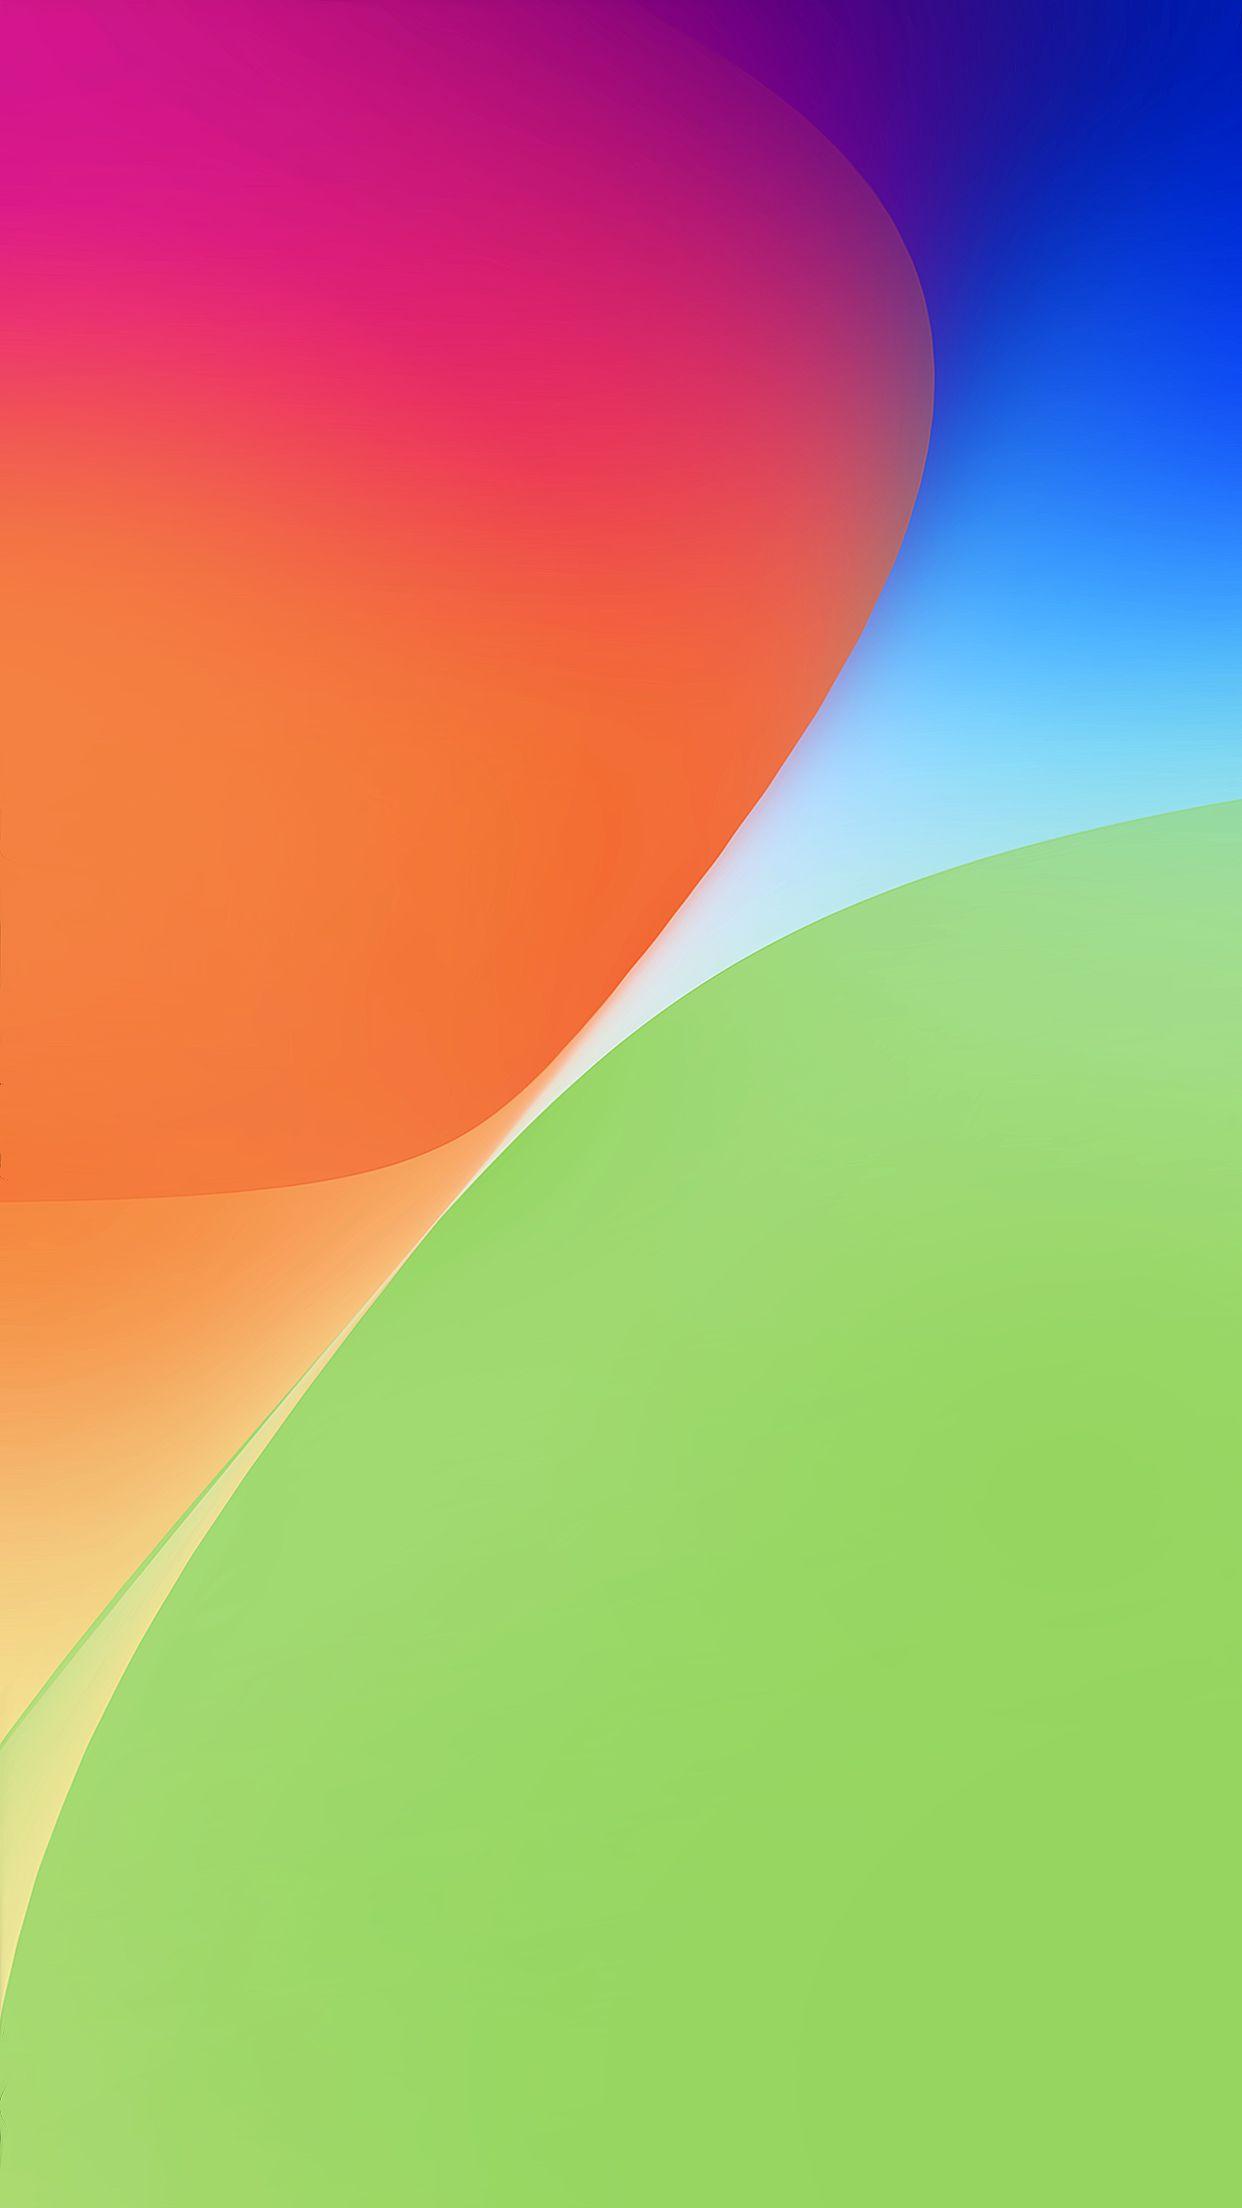 Epingle Par Dada Shu Sur Wallpaper Ecran Iphone Fond Ecran Couleur